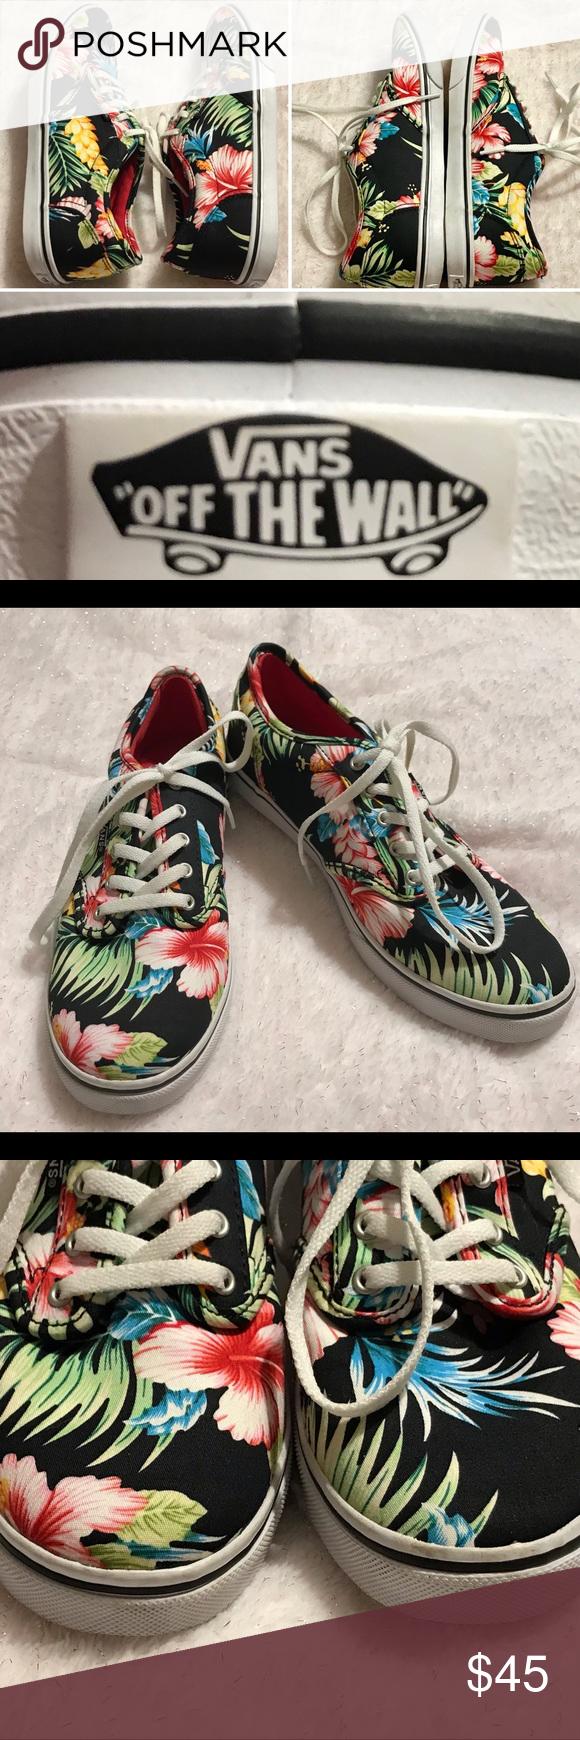 13820c8ac2 Vans Authentic Hawaiian Floral Skate Shoes Size 7 Vans Womens Authentic  Hawaiian Floral Canvas Skate Shoes